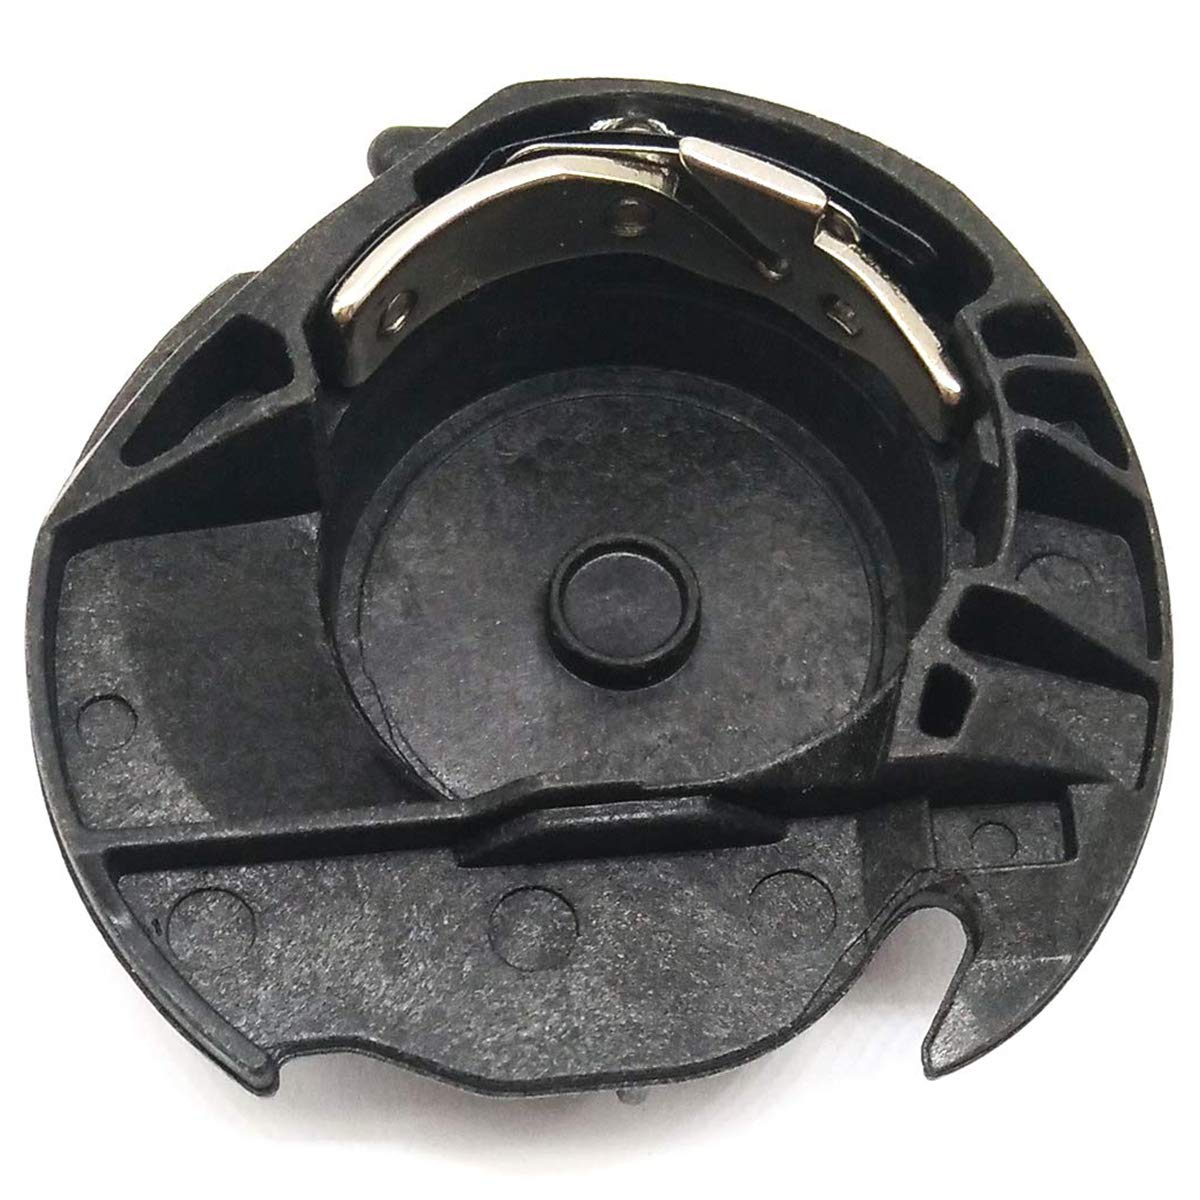 CKPSMS Brand 1PCS #XC8993321 Bobbin Case fit for Brother Sewing Machine XL2240,XL2250,XL2600,XL3500+